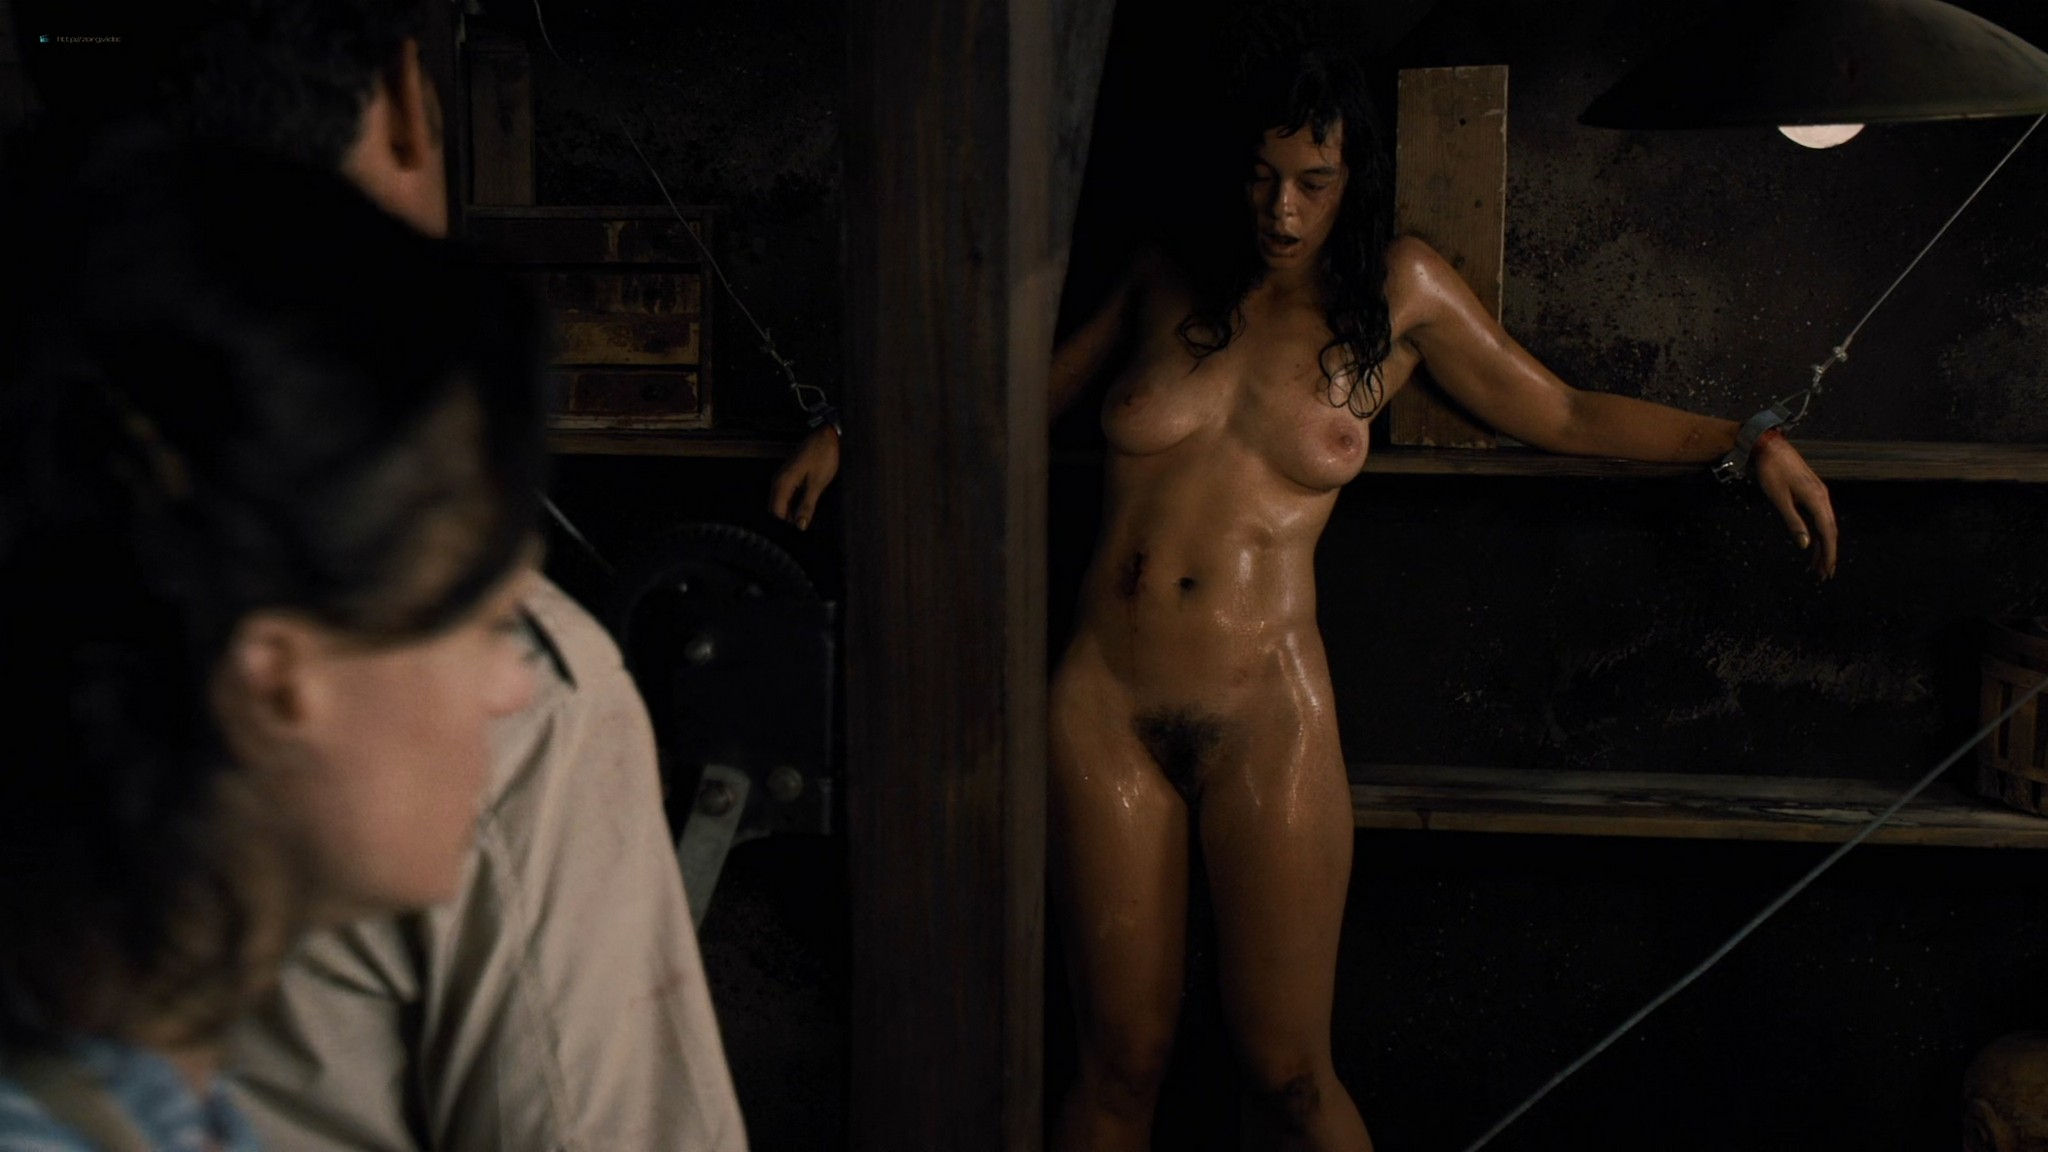 Anna Schudt Nude Pics Pics, Sex Tape Ancensored